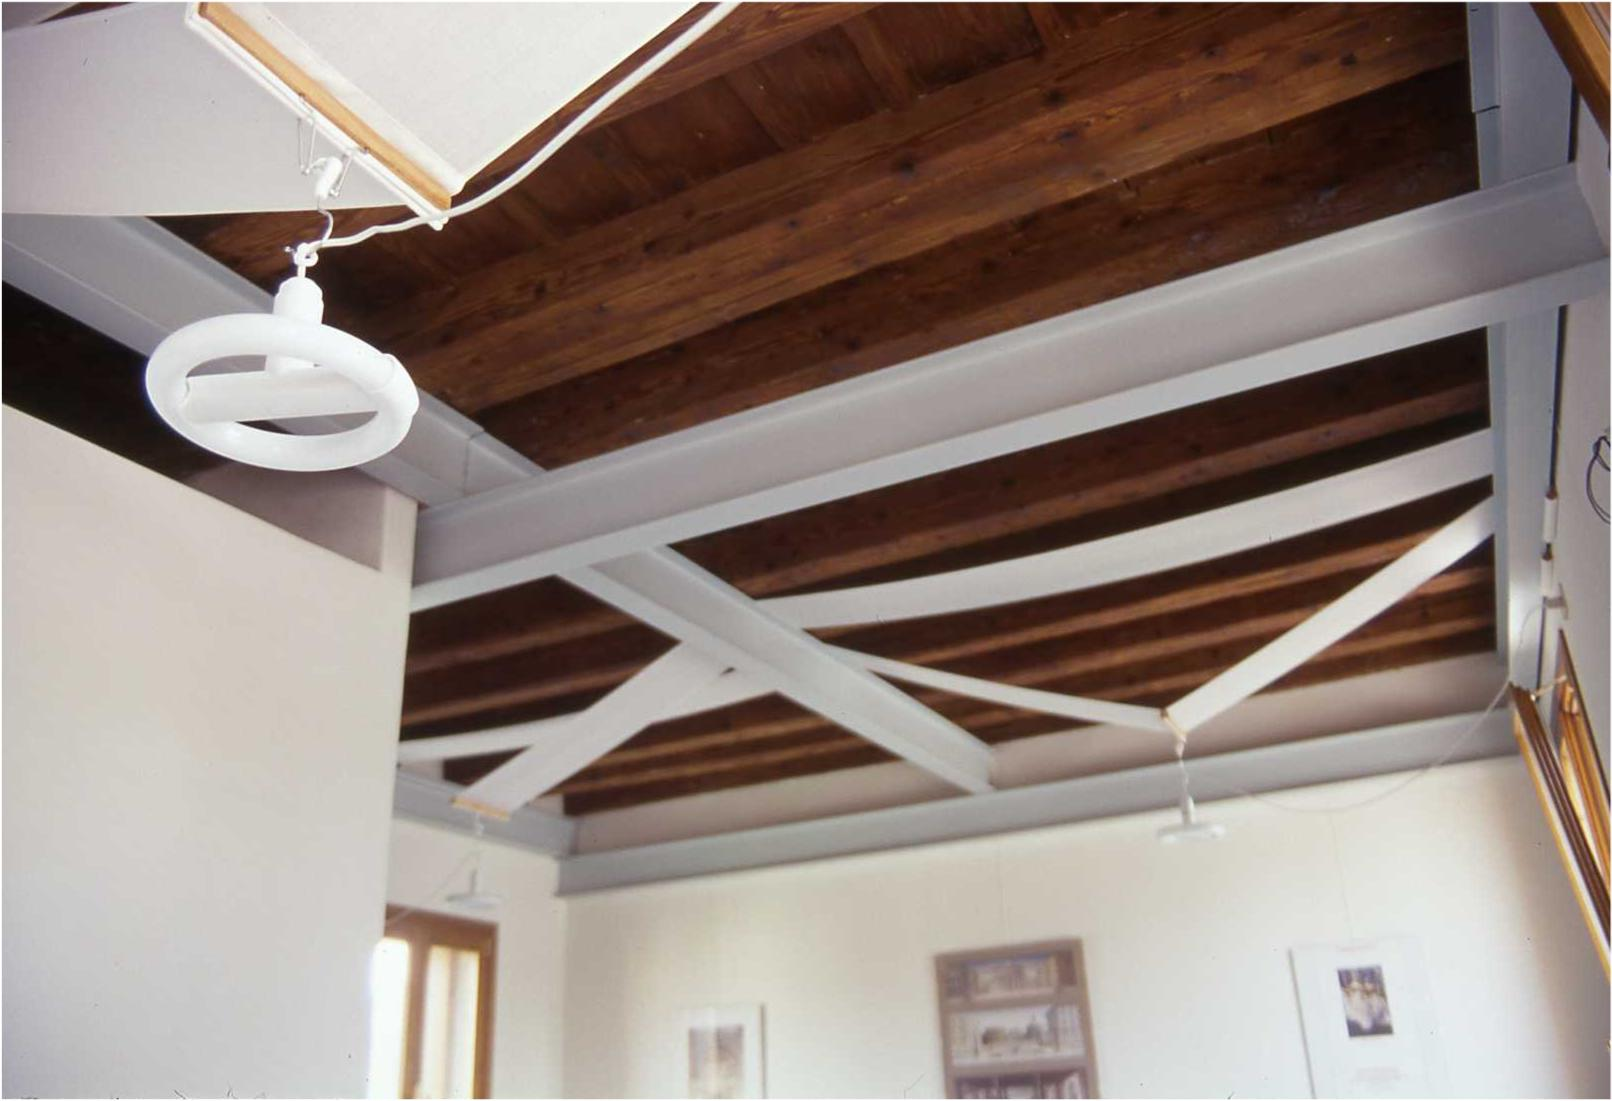 Soffitto in legno scuro: soffitto in legno scuro lampada ad arco.